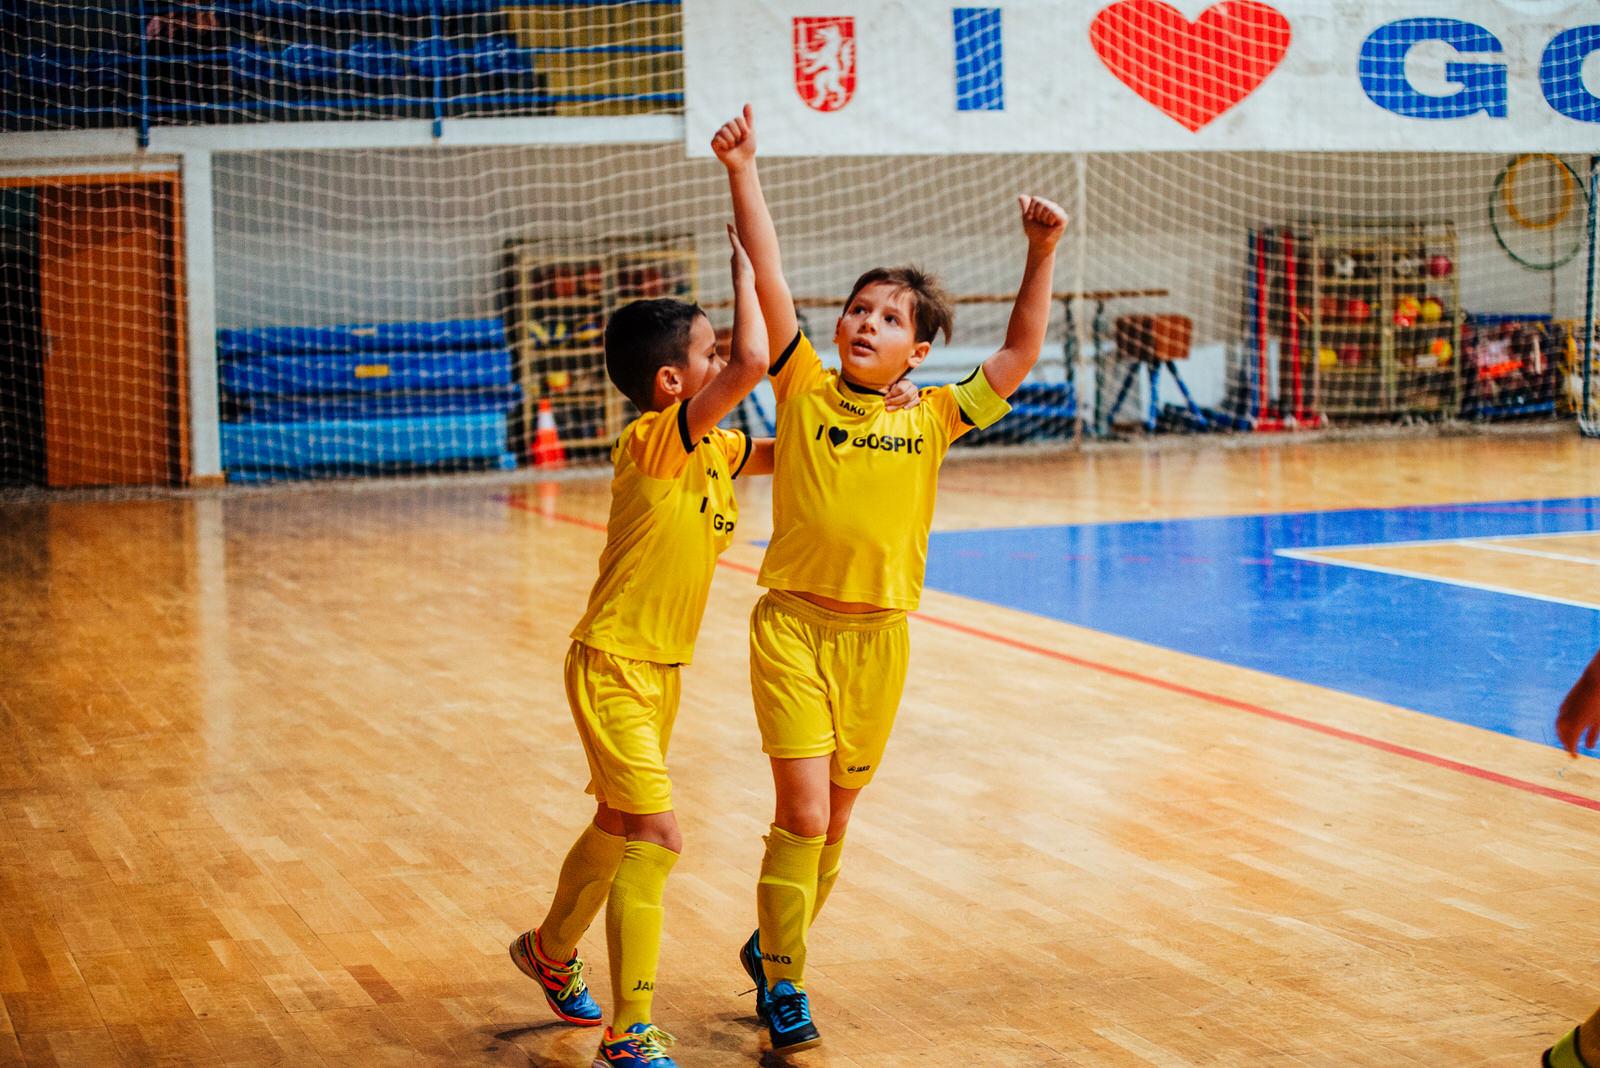 likaclub_zimska-malonogometna-liga-gospić_2019-20-46